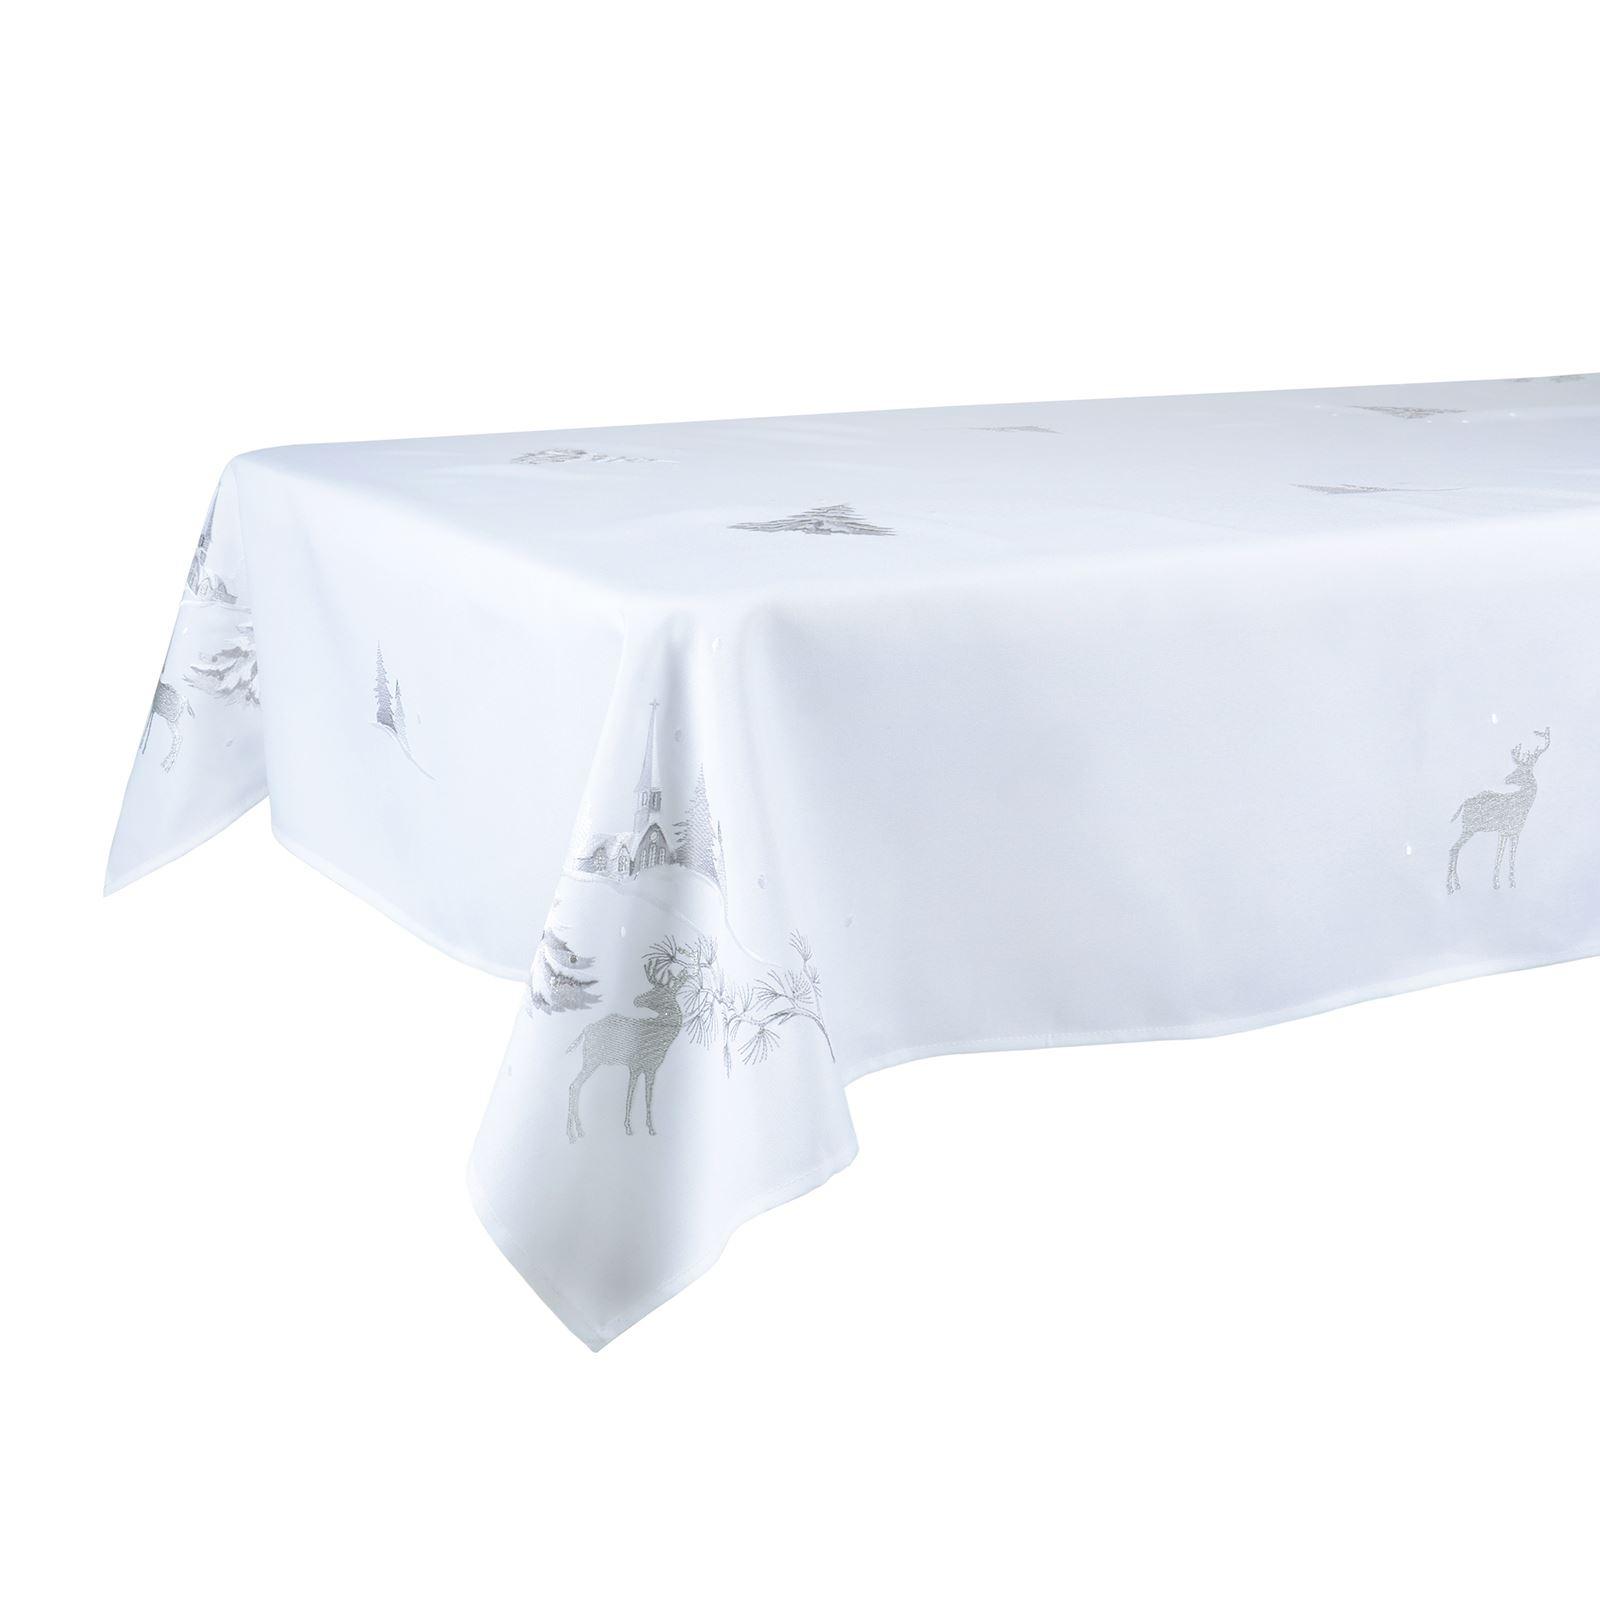 Christmas-Tablecloth-Festive-Pattern-Rectangle-Round-Fabric-Xmas-Room-Decoration Indexbild 56